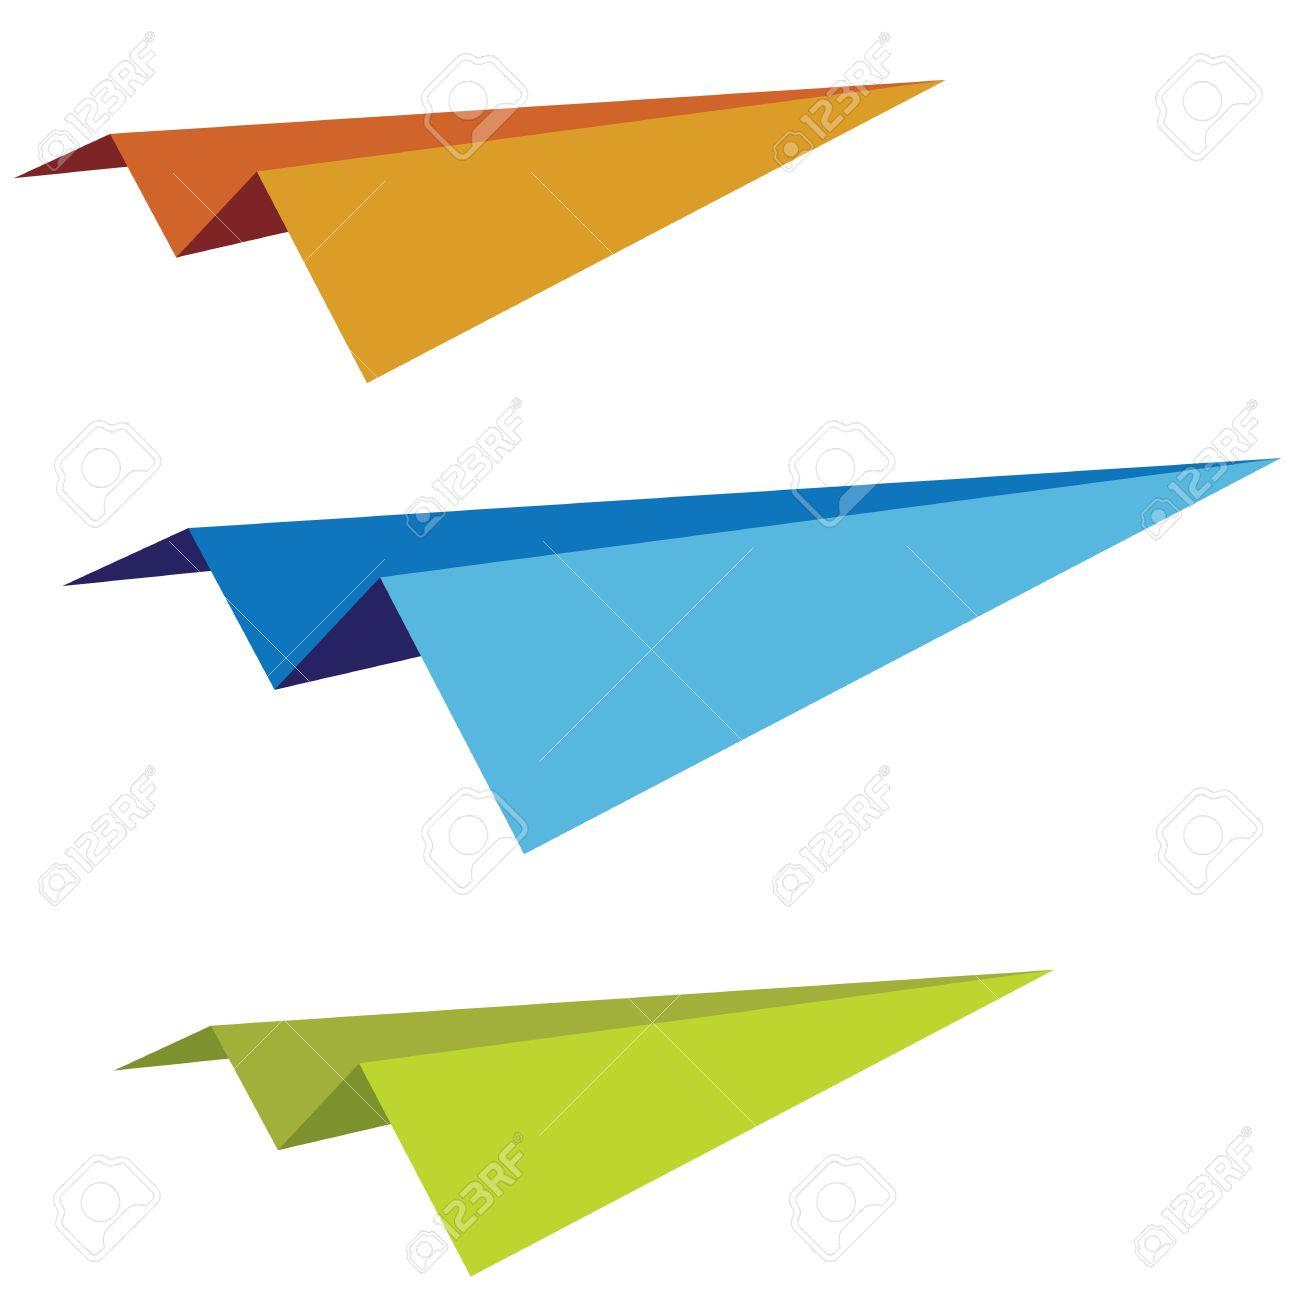 paper plane stock illustration - photo #8